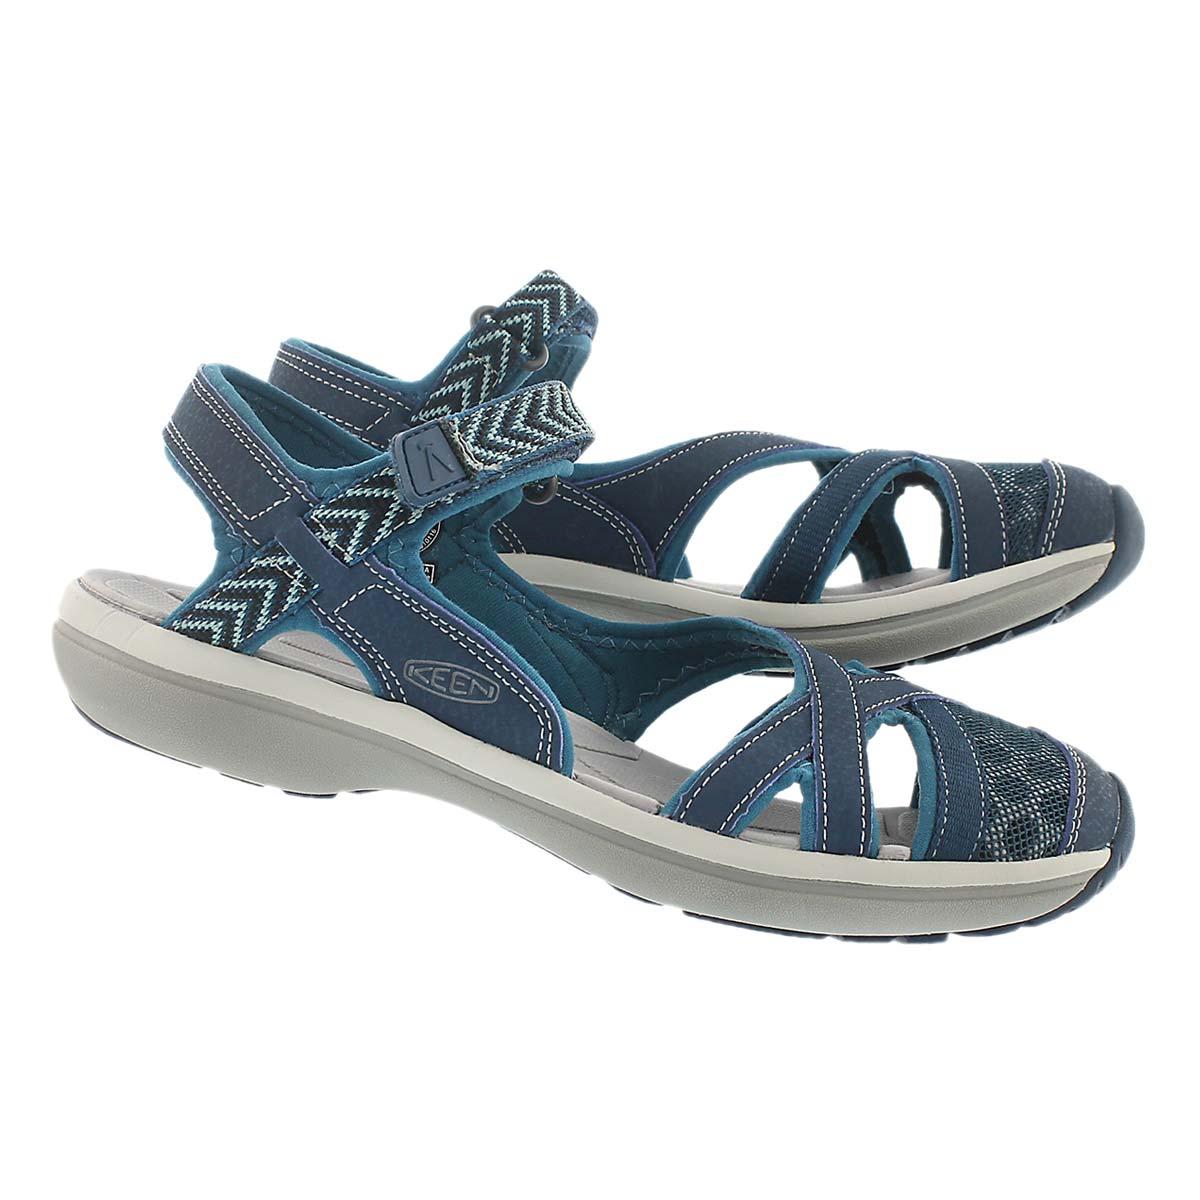 Lds Sage Ankle poseidon sport sandal